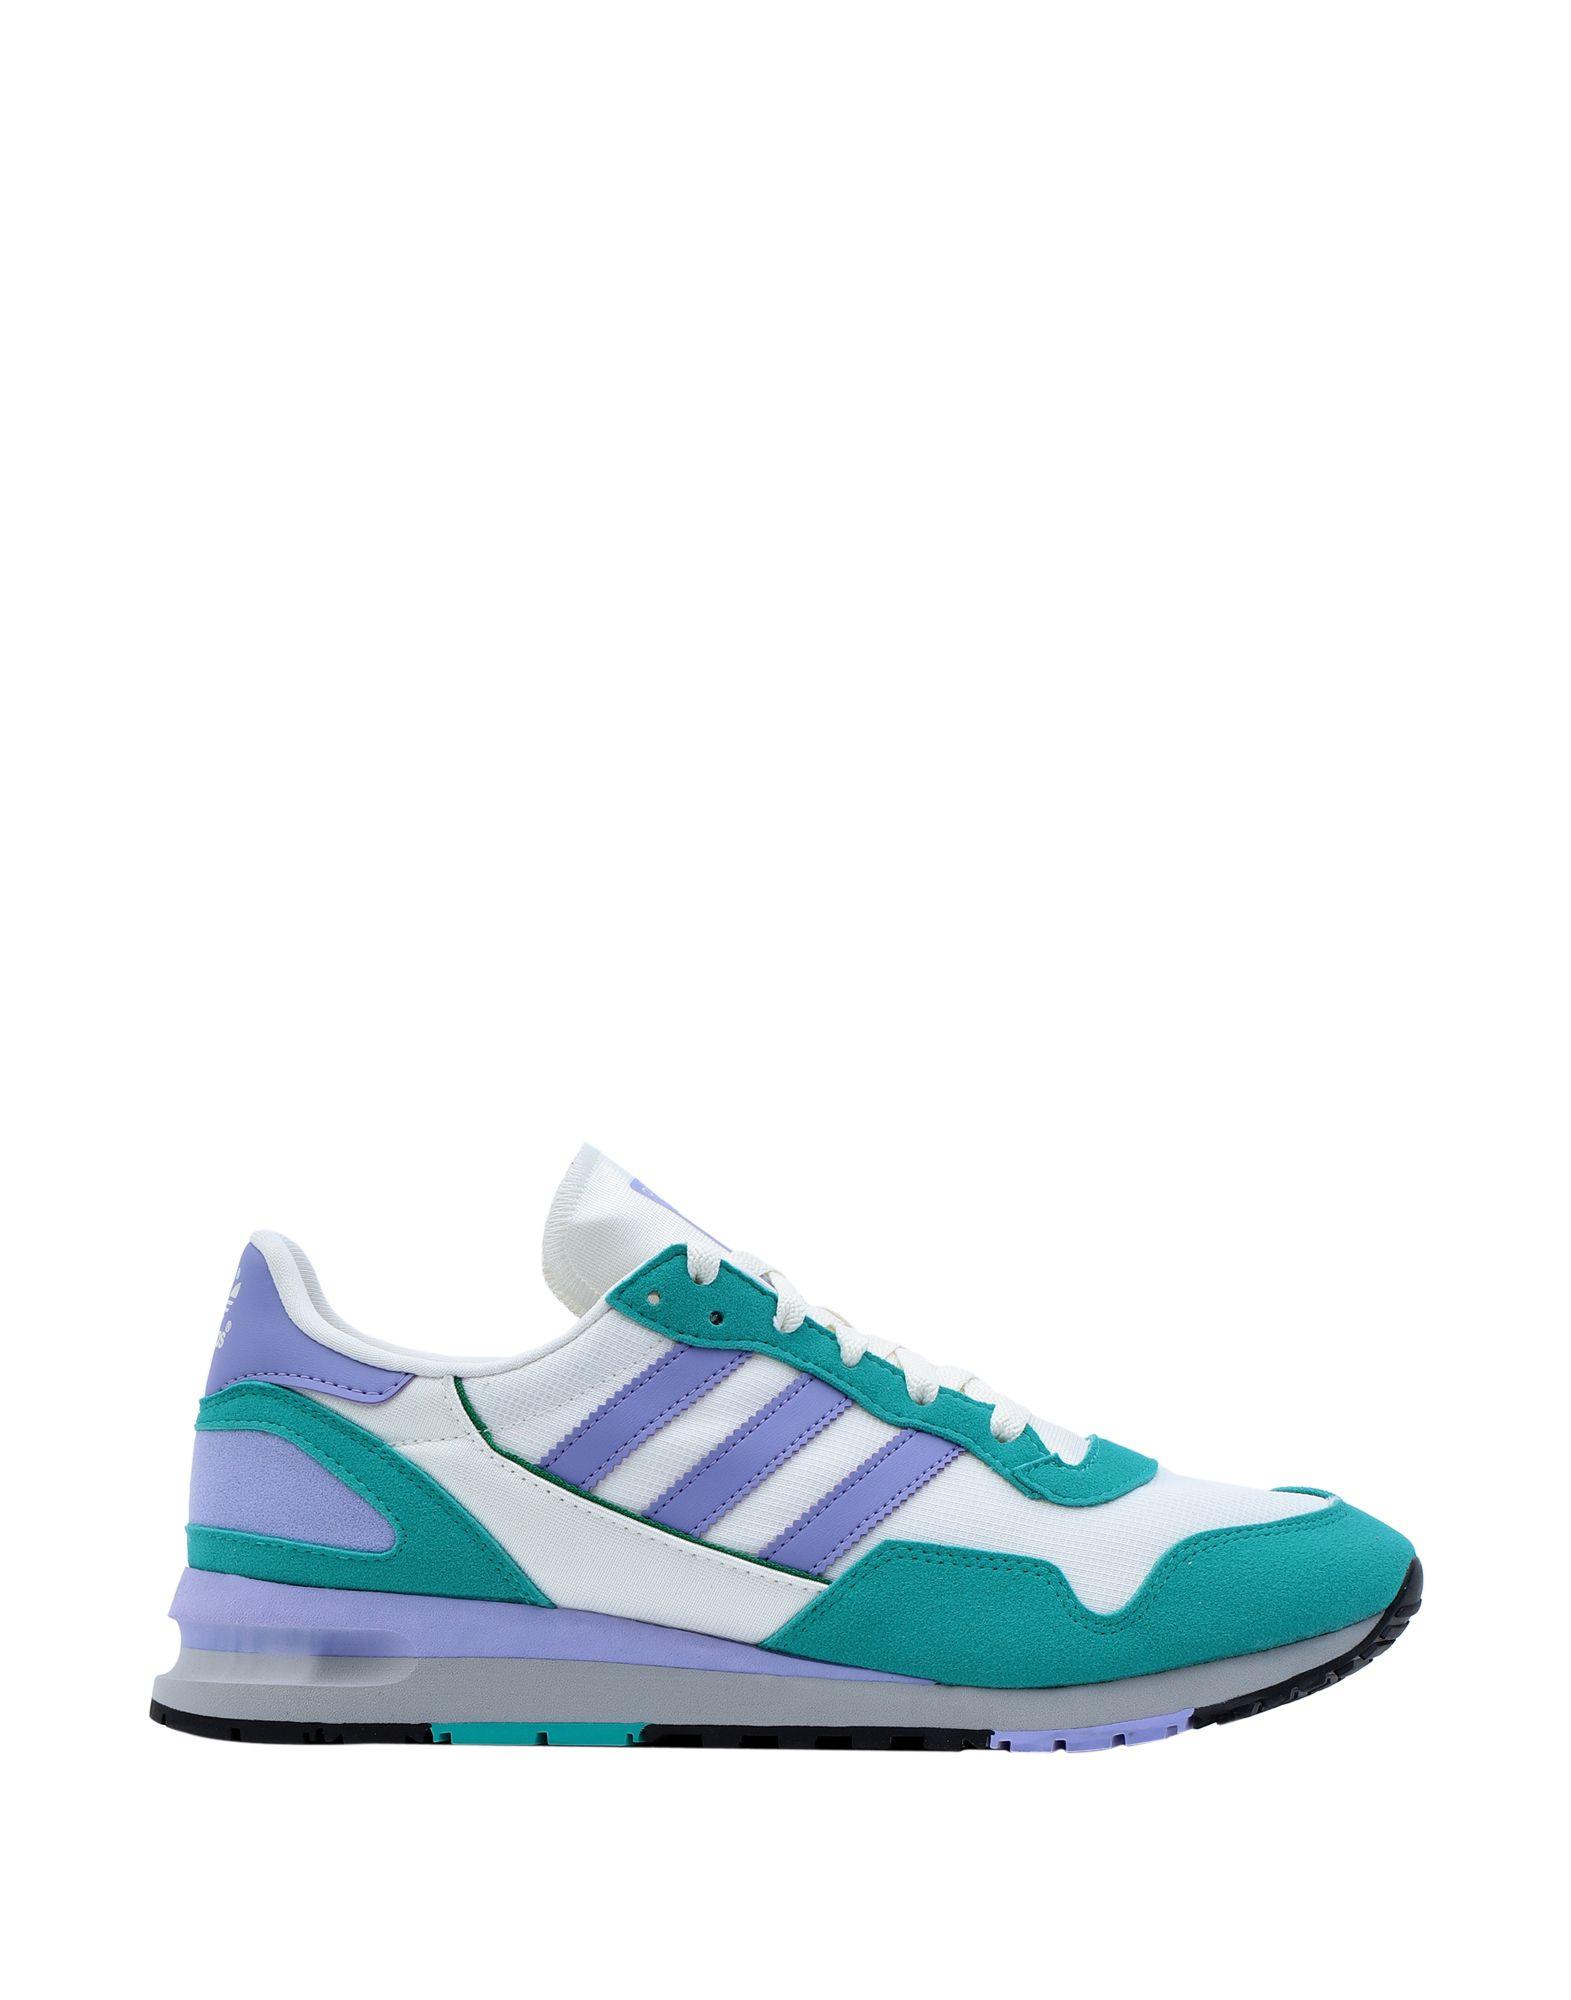 Turnschuhe Adidas Originals Lowertree Spzl - herren - 11577959FW